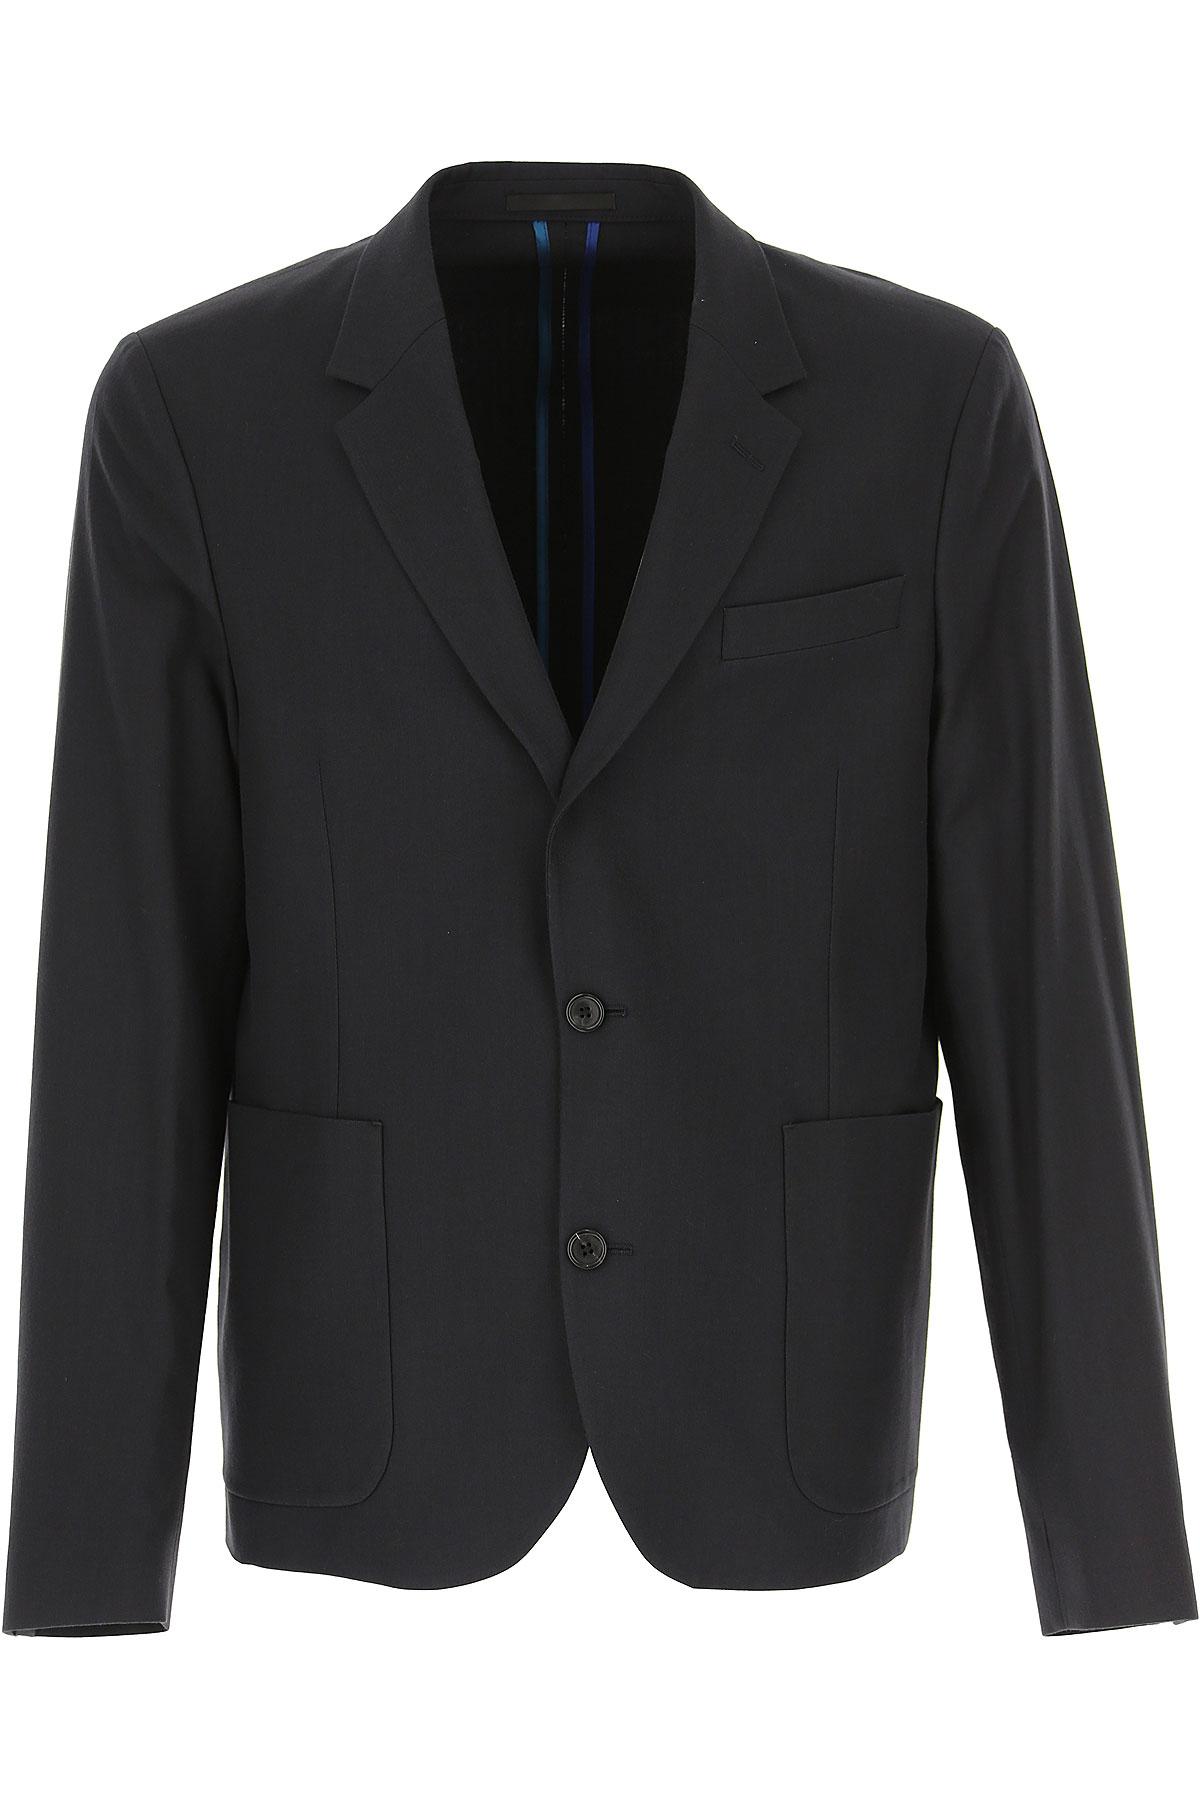 Paul Smith Blazer for Men, Sport Coat On Sale, Dark Blue Navy, Cotton, 2019, L M XL